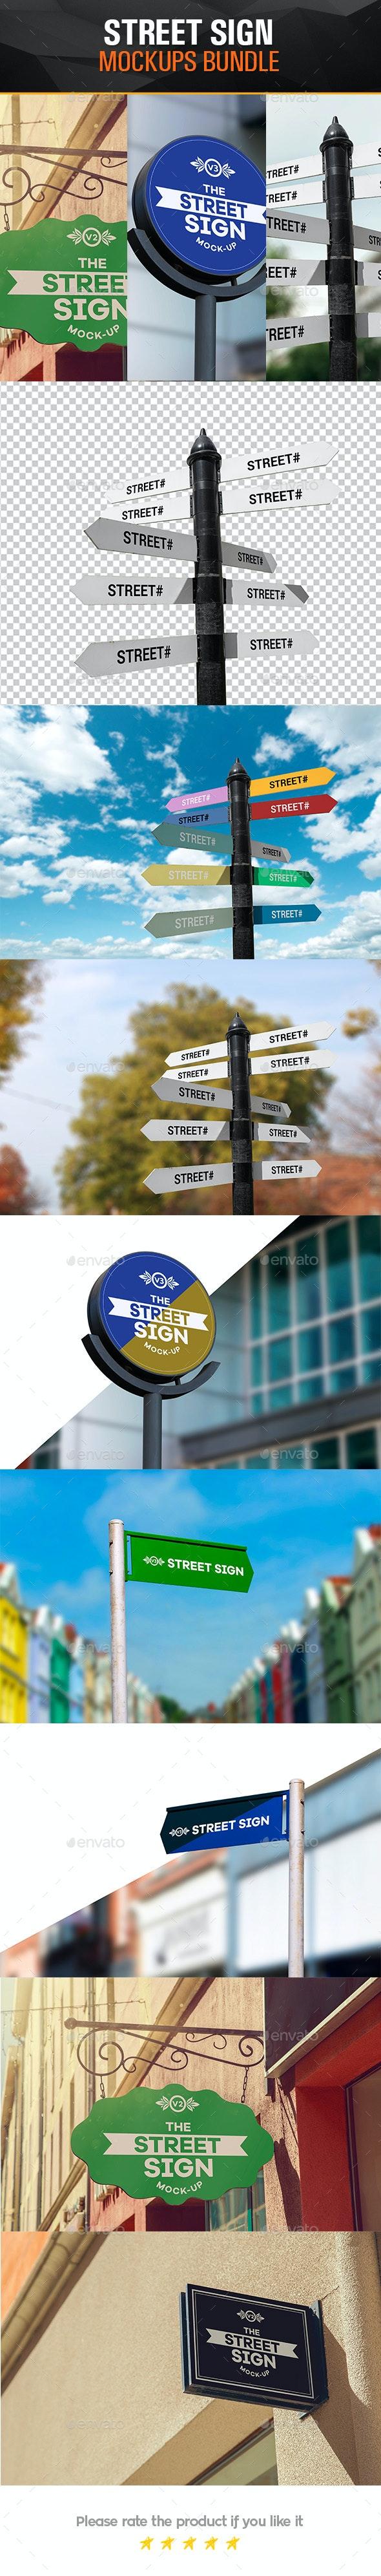 Street Sign Mock-Up Bundle - Product Mock-Ups Graphics